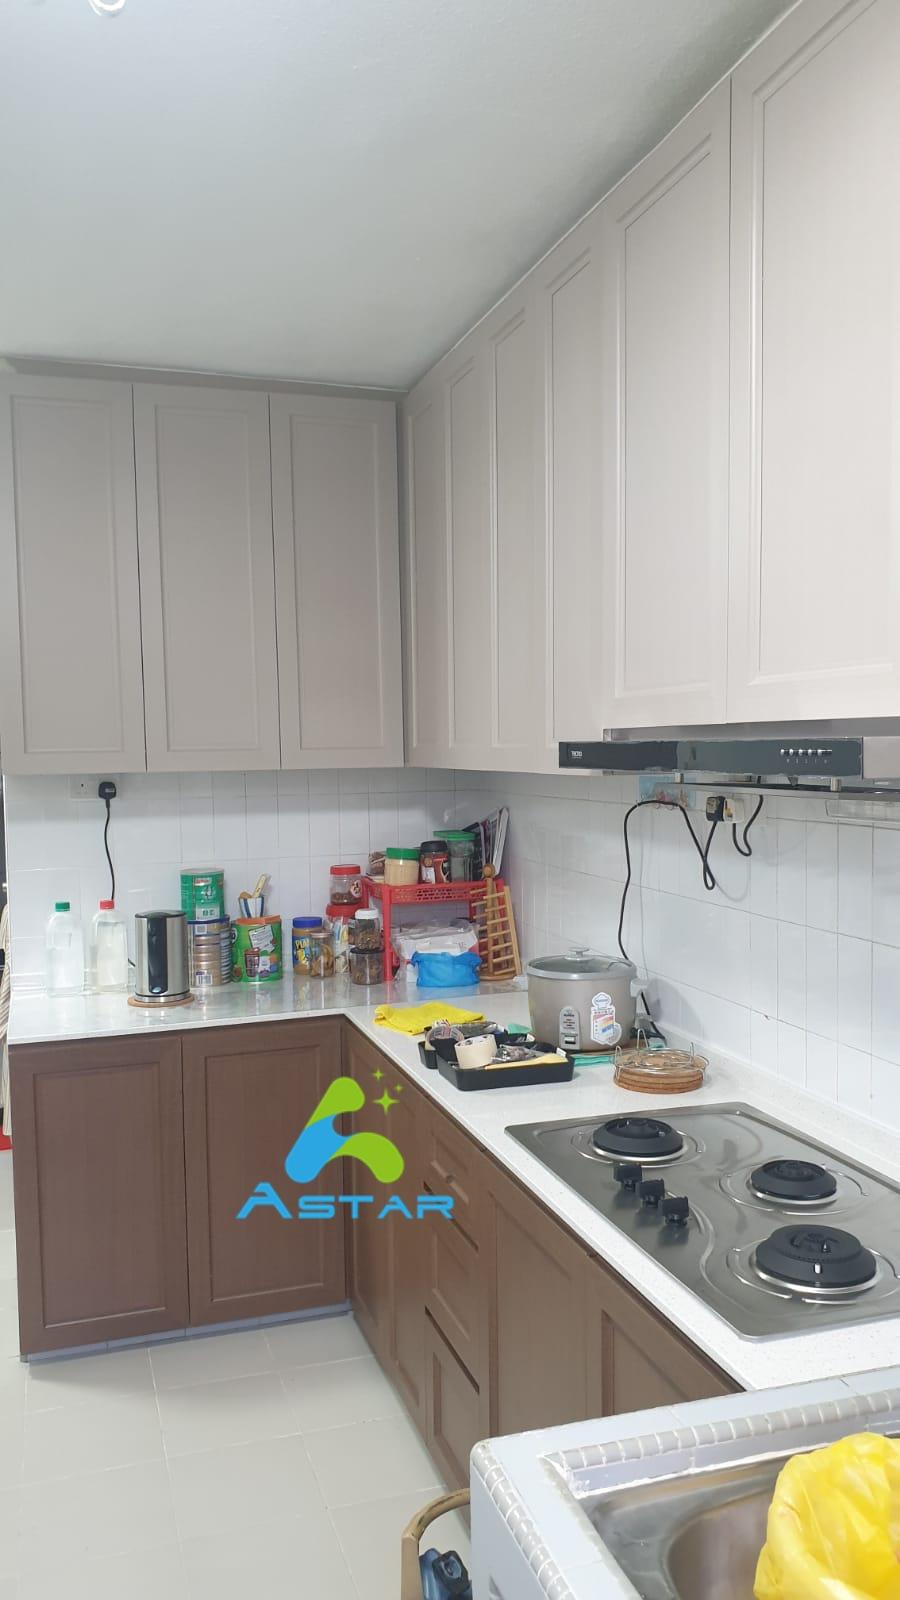 a star furnishing projects Blk 816 Yishun St 81 S 760816 5